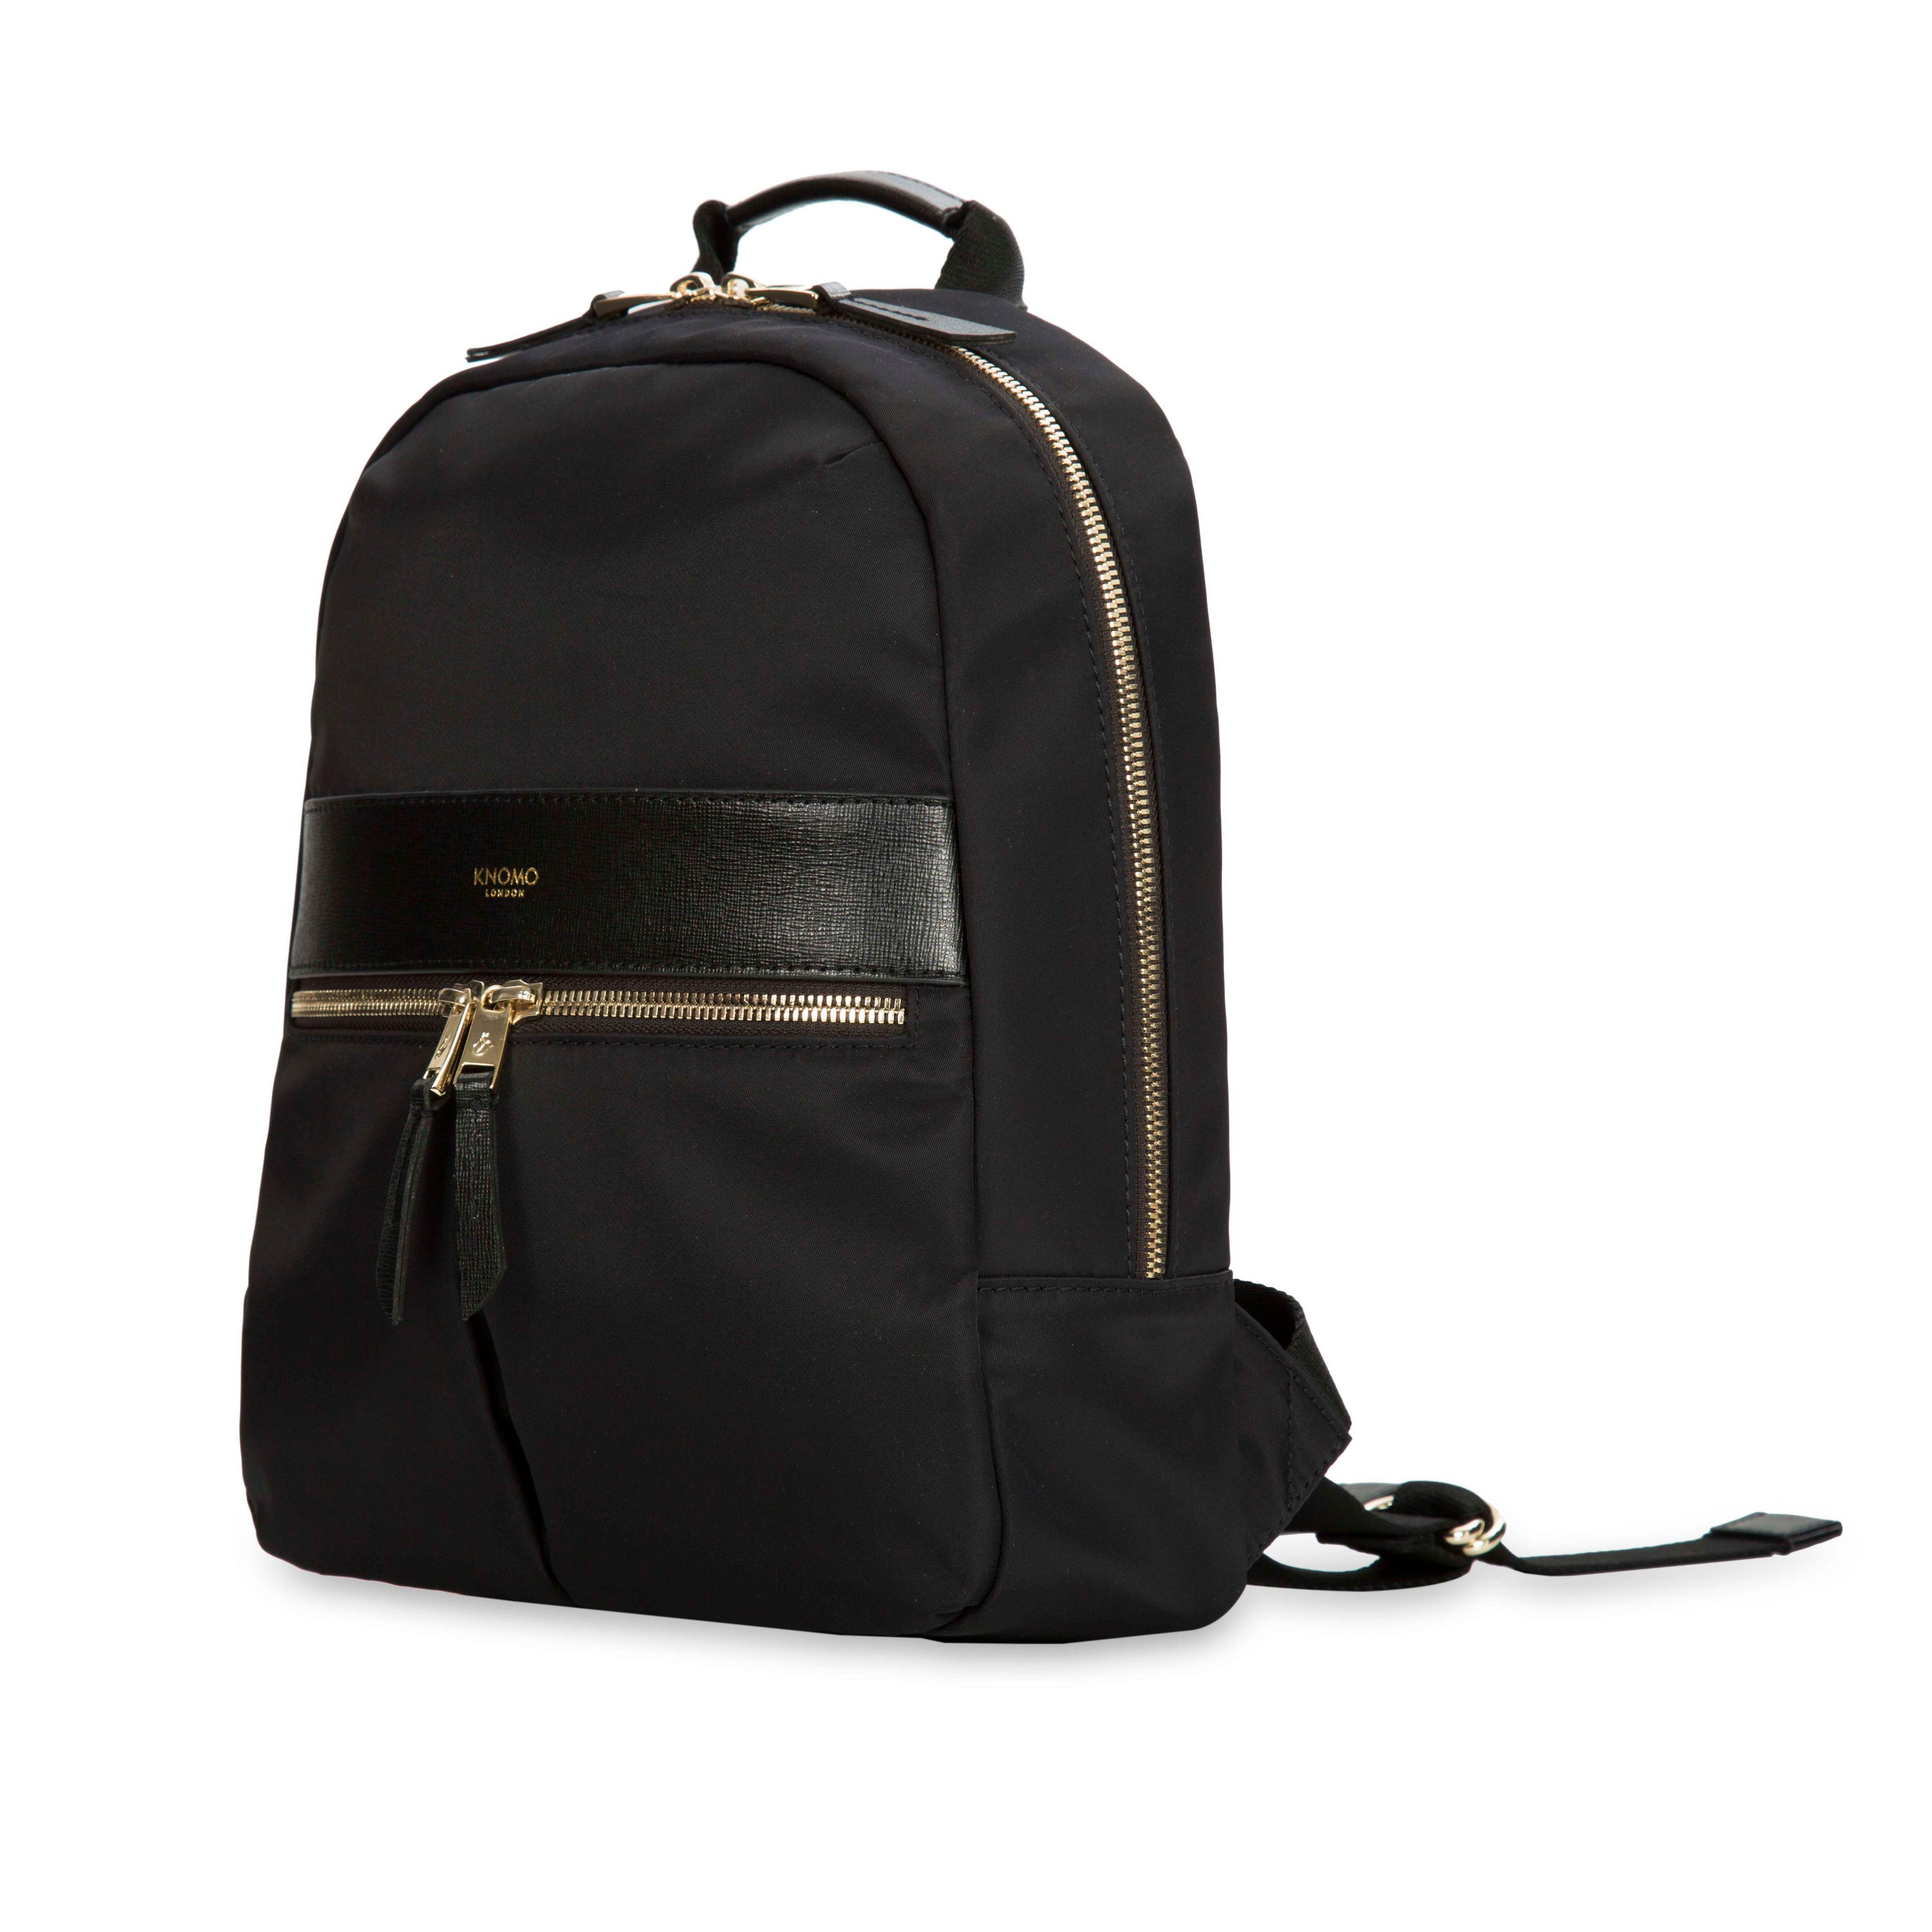 Knomo Baby Beauchamp 10 Backpack Black In Black Lyst